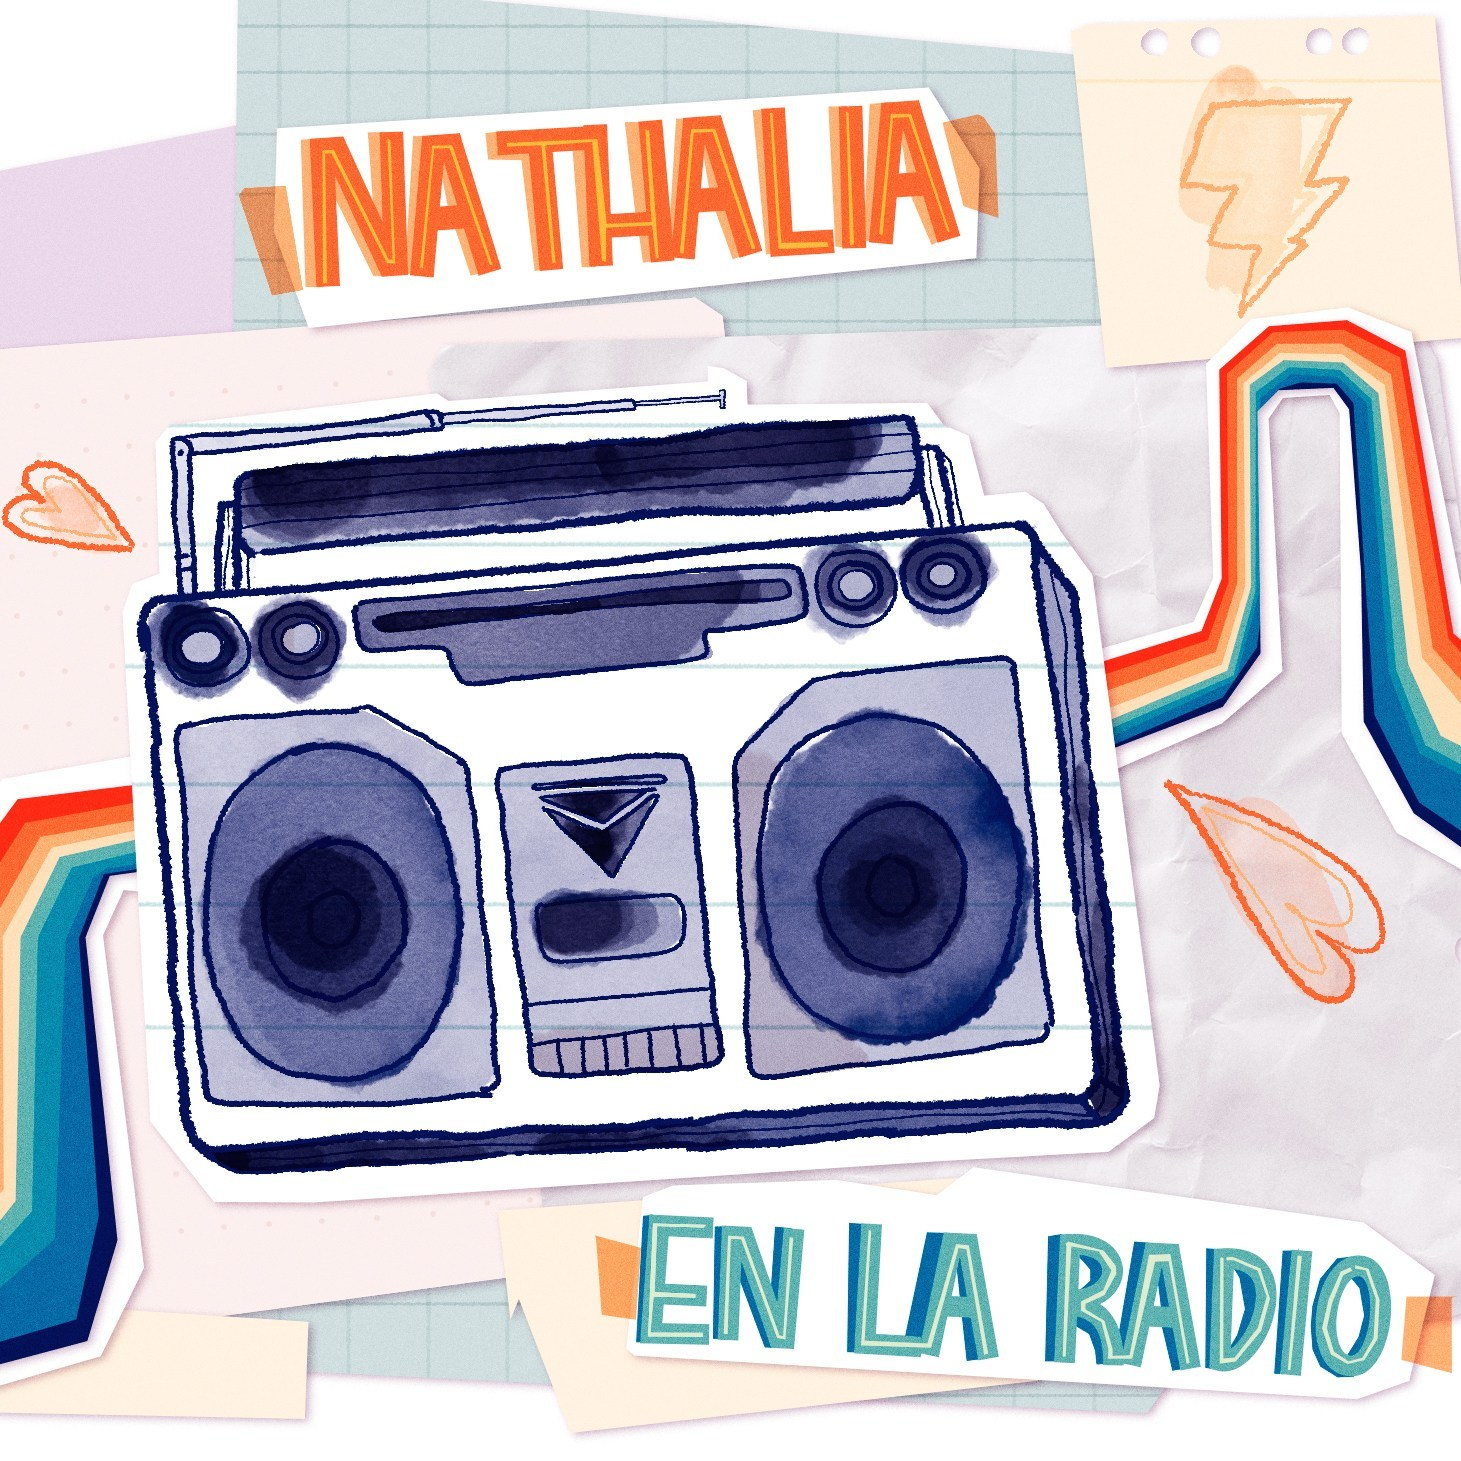 Nathalia CD